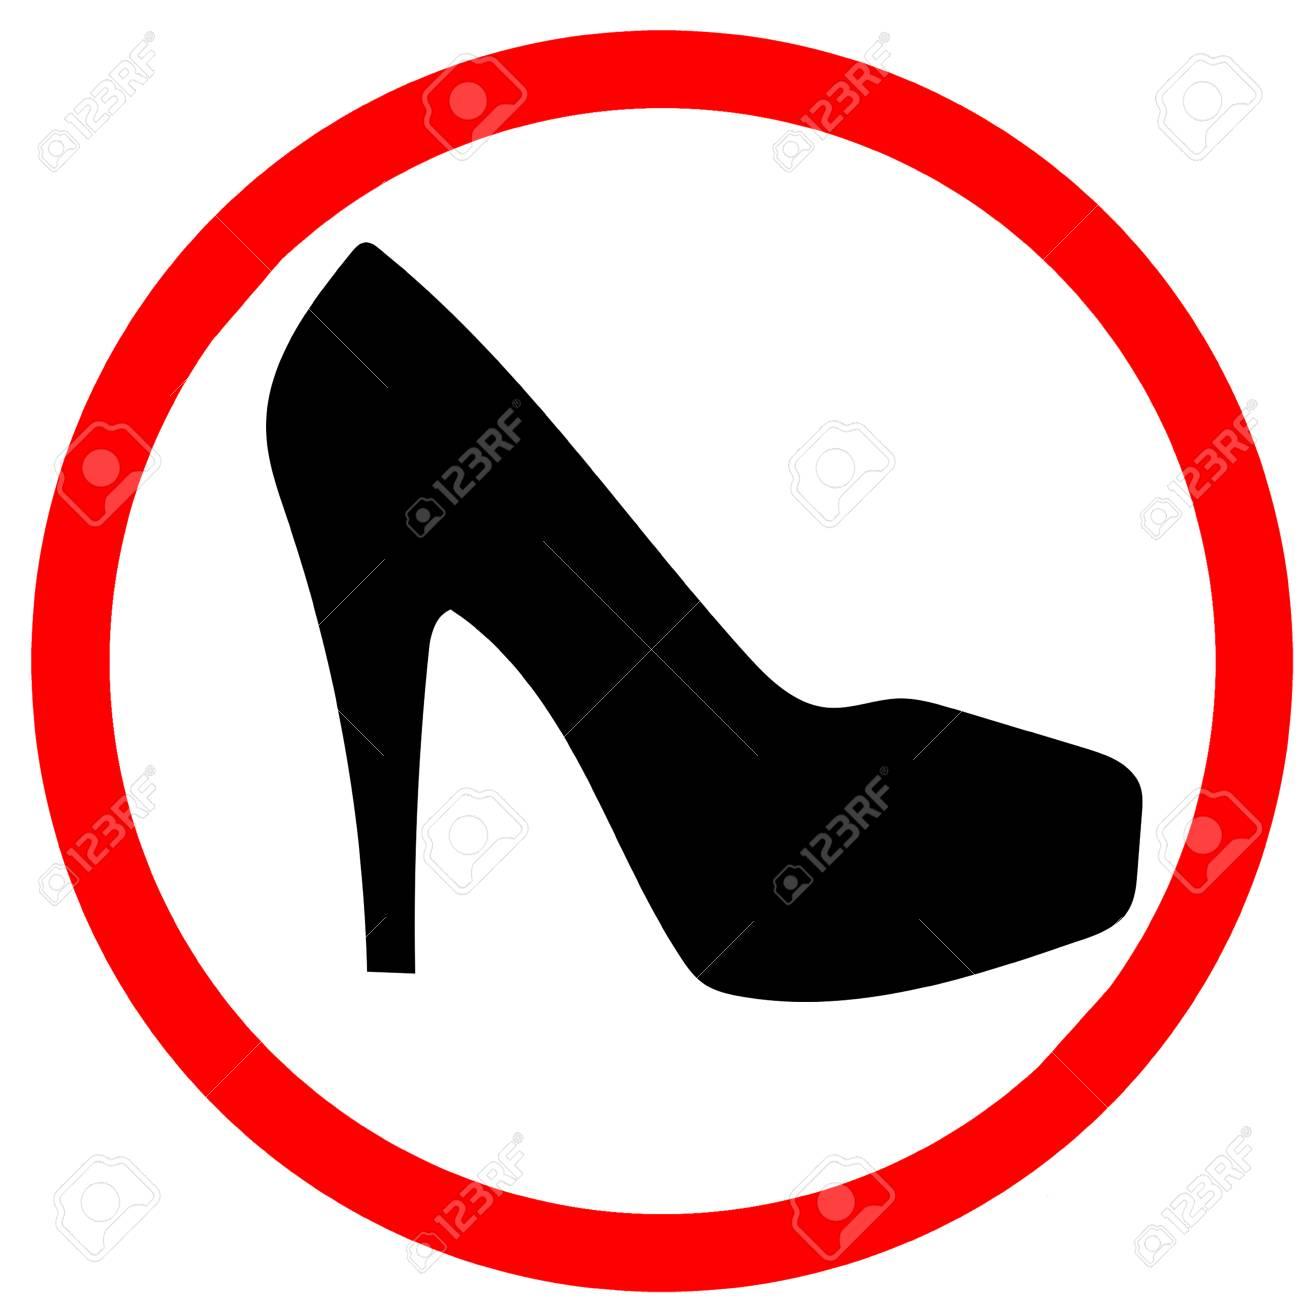 Woman Warning High Heel Shoes Girl